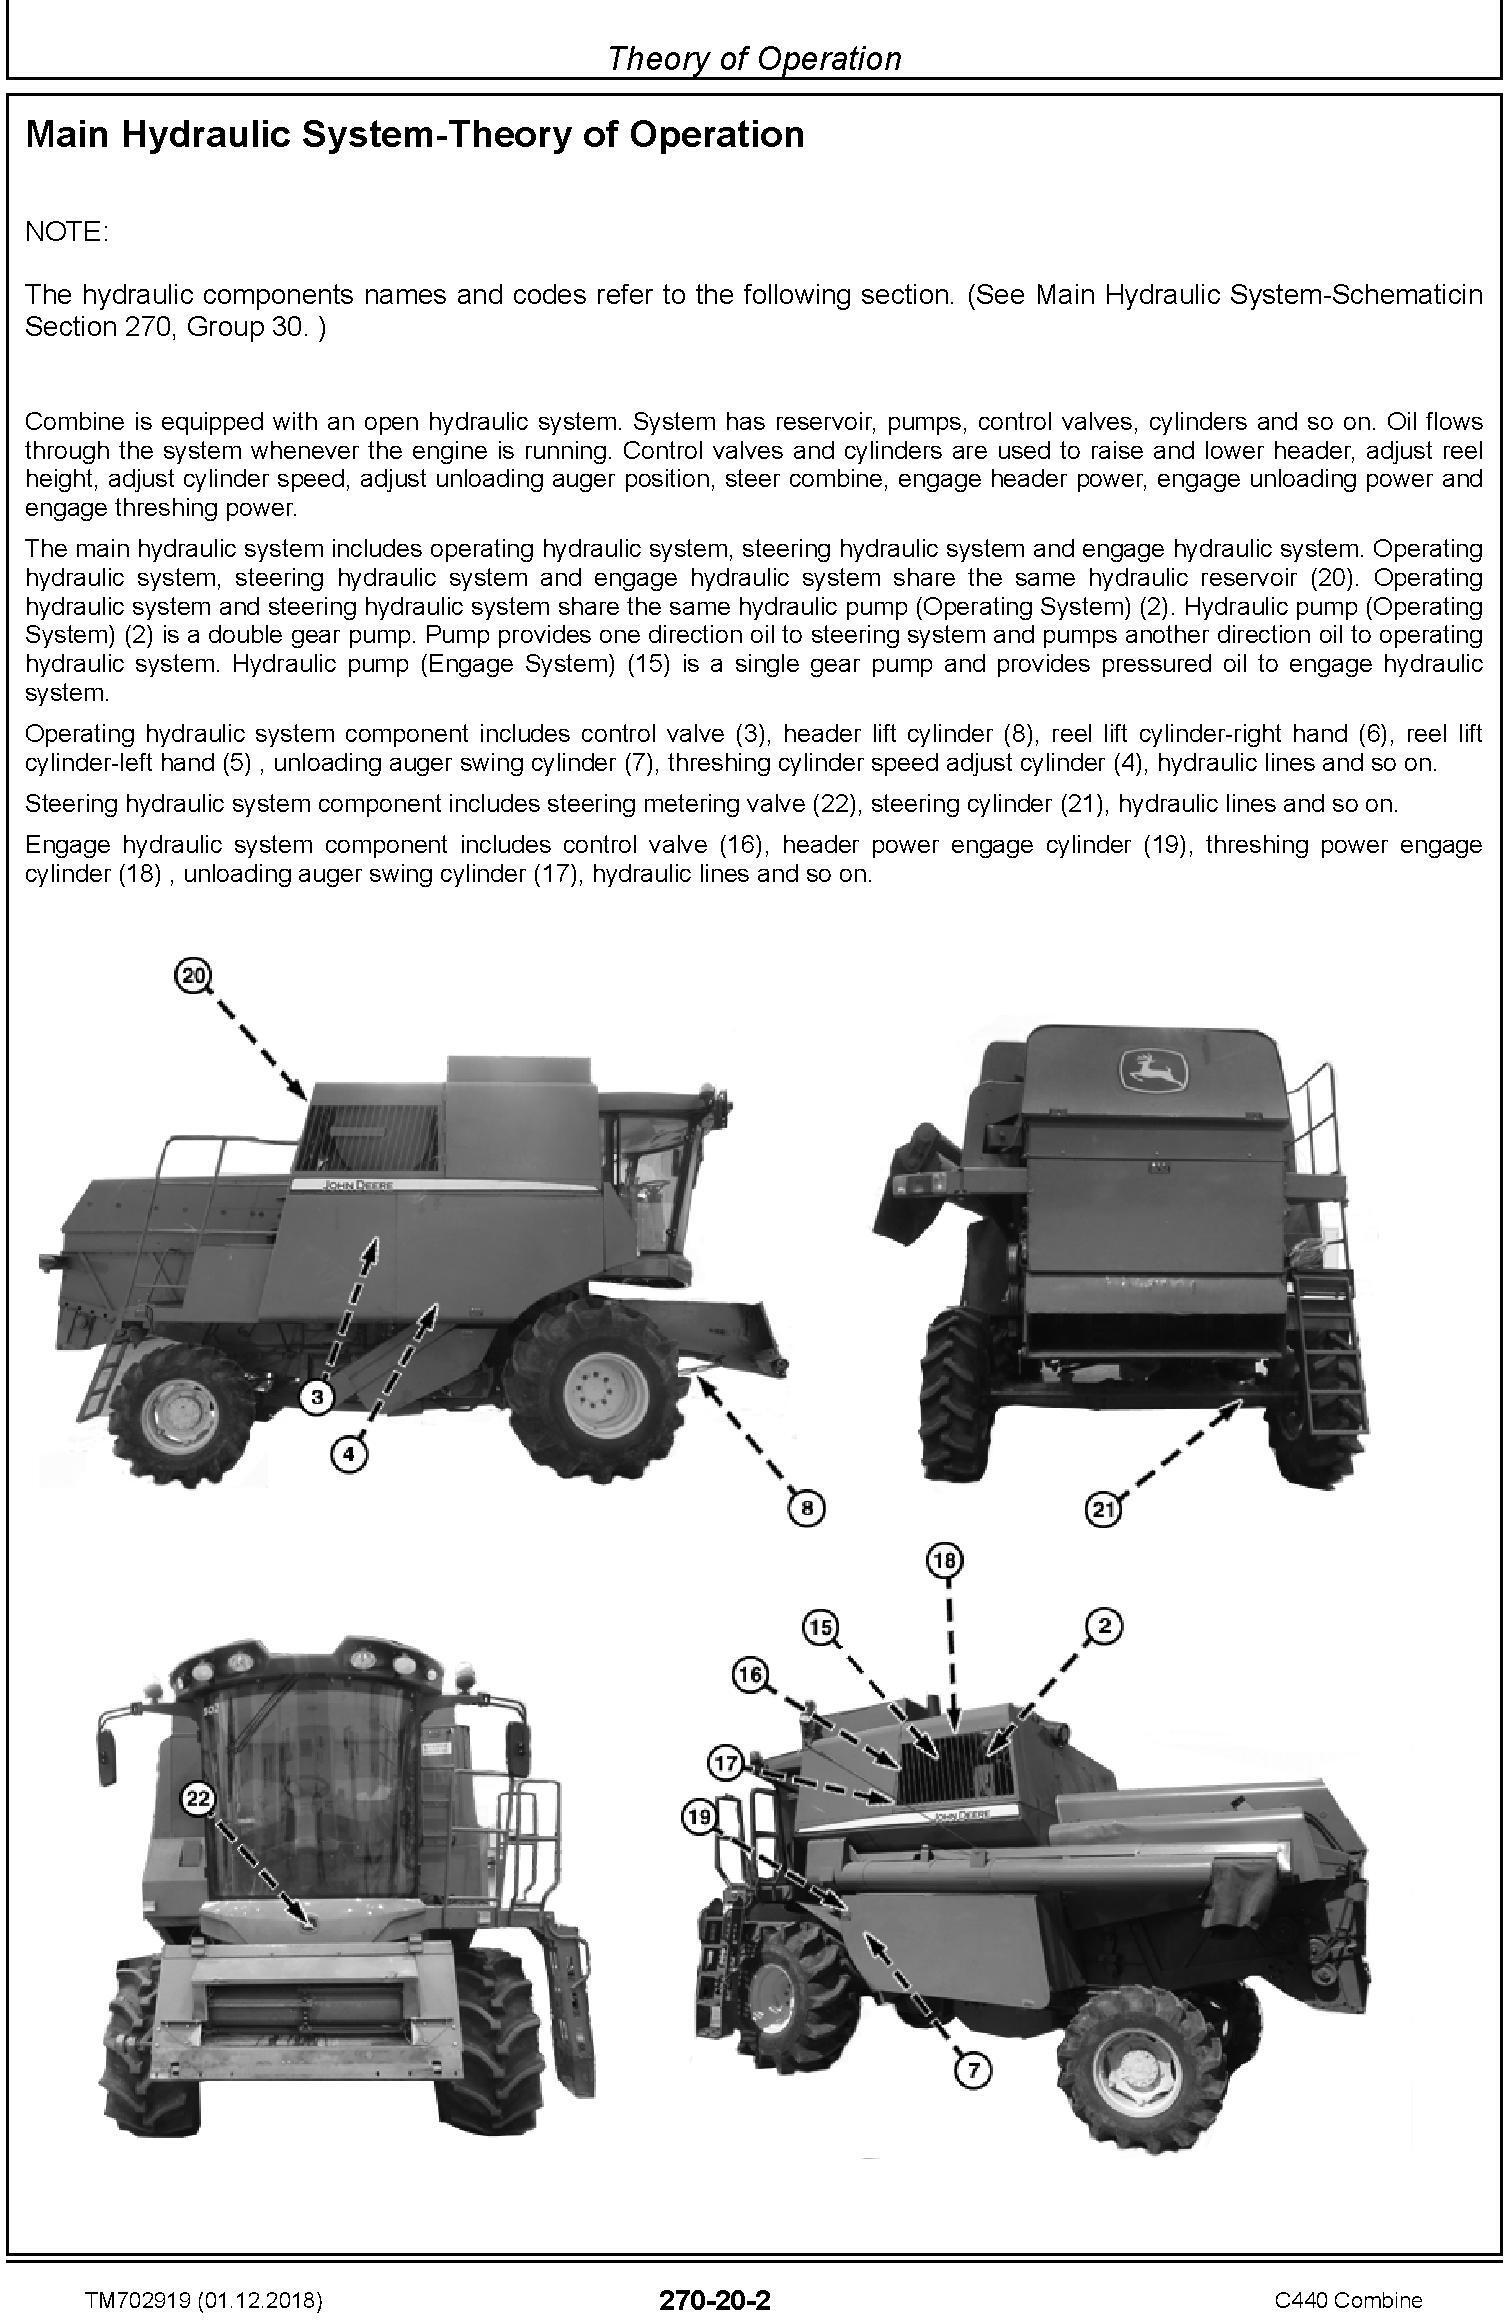 John Deere C440 Combine (SN. 020000-) Technical Service Manual (TM702919) - 1